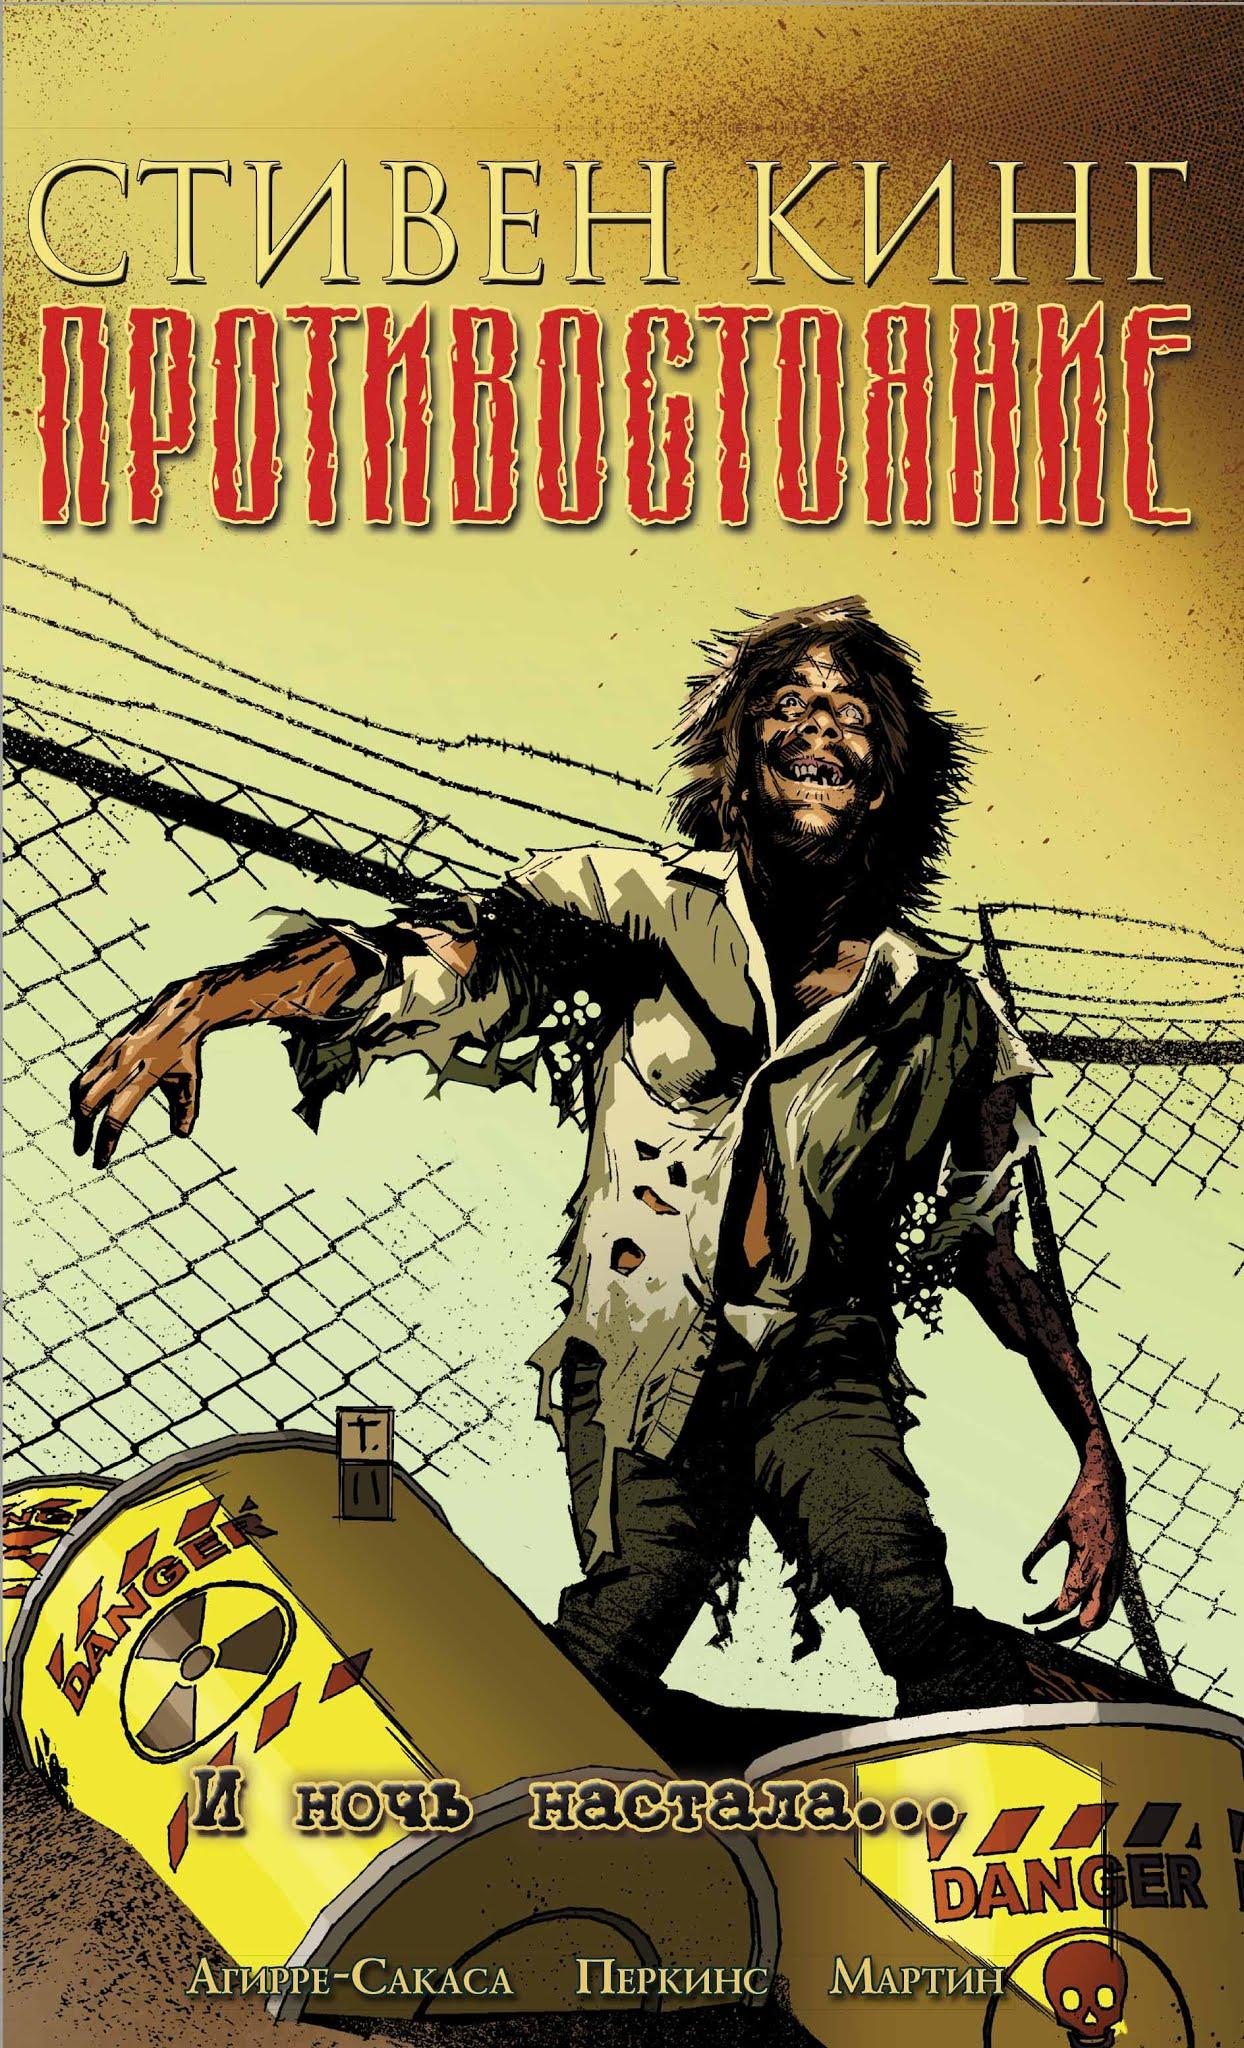 Комикс «Стивен Кинг. Противостояние. И ночь настала…» (2012)